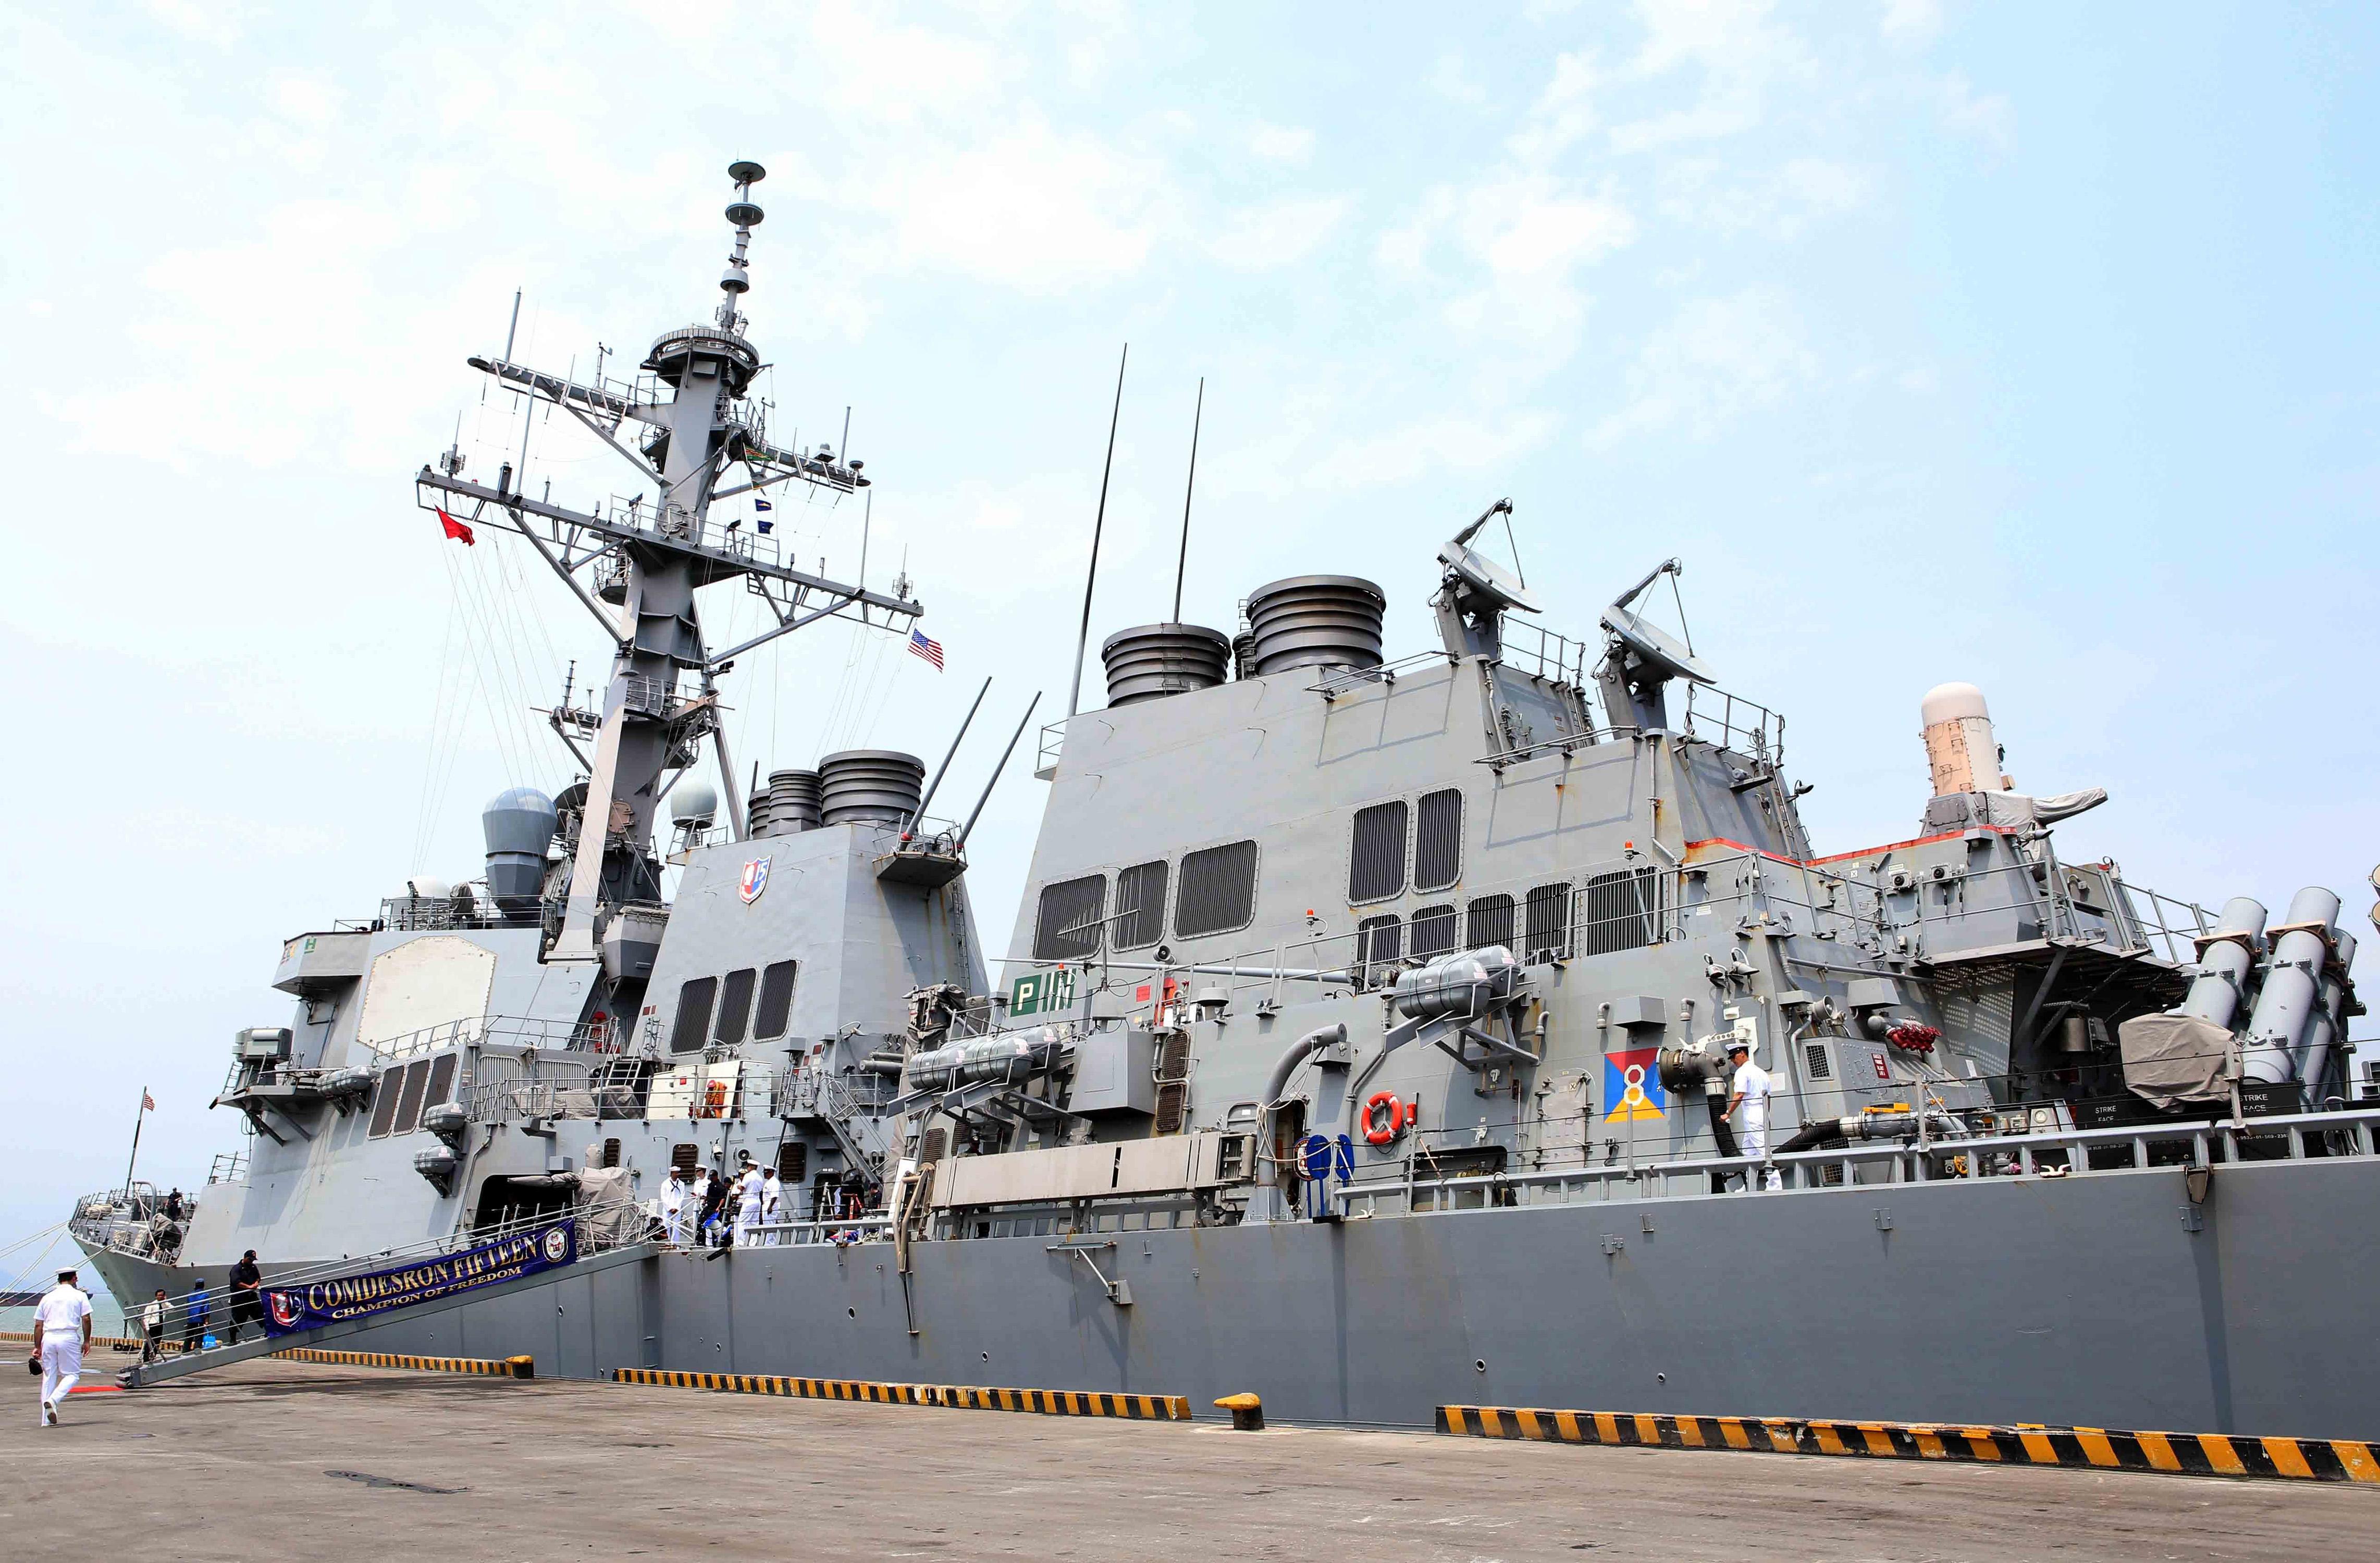 Navy report details crash scene inside destroyer Fitzgerald Featured